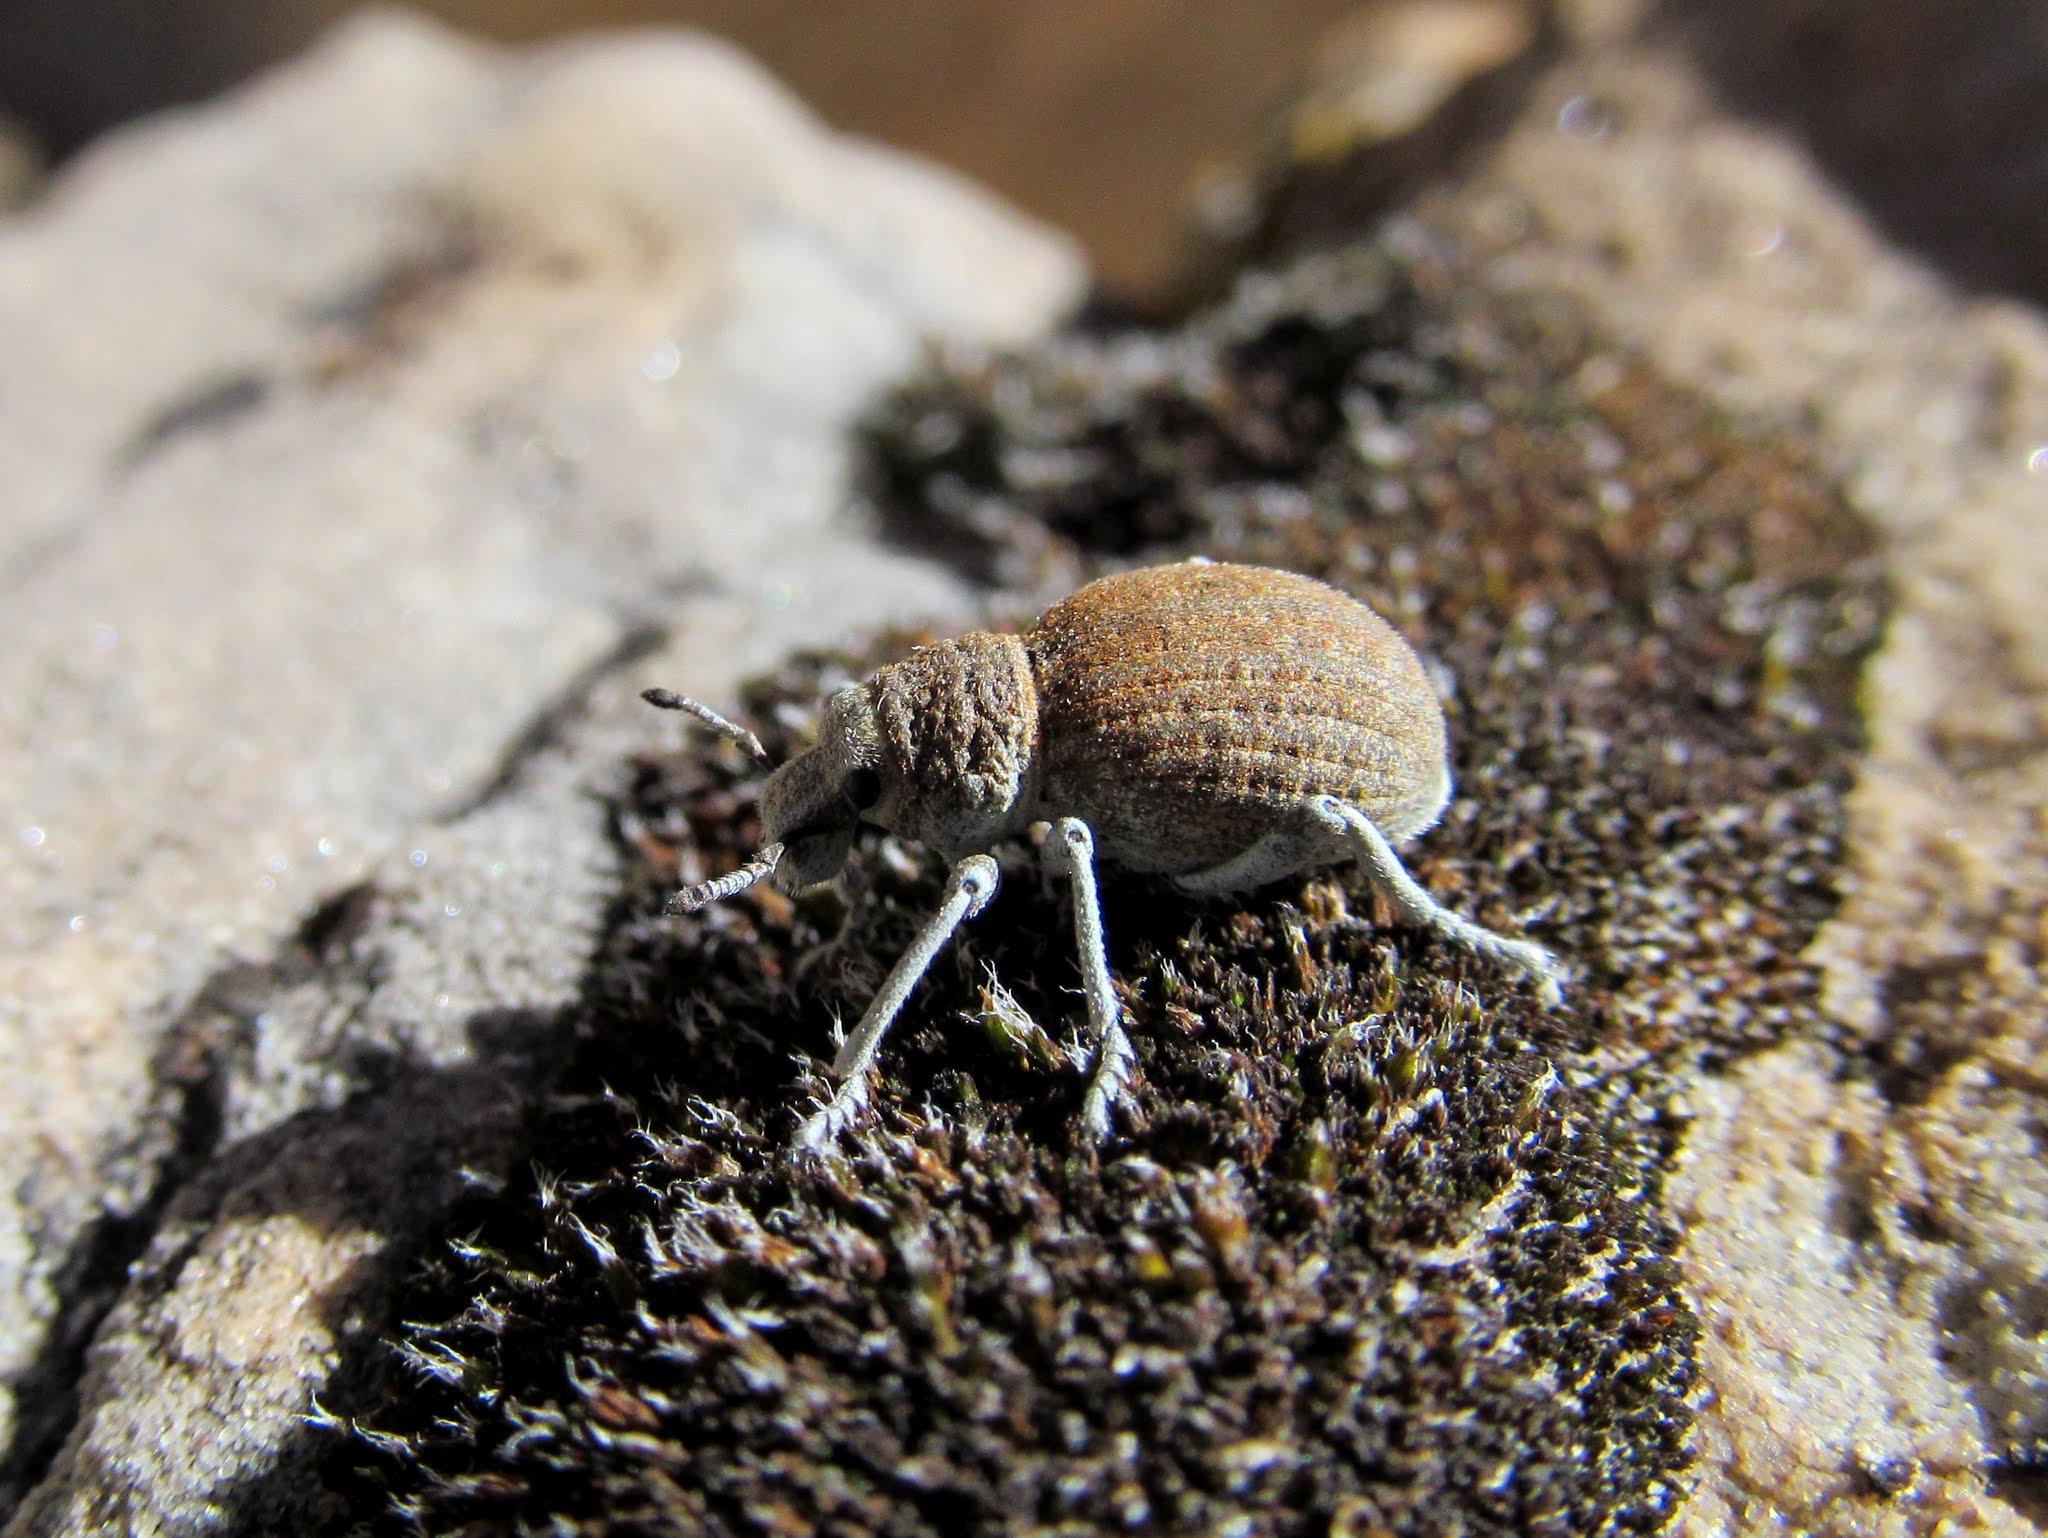 Photo: Strange insect